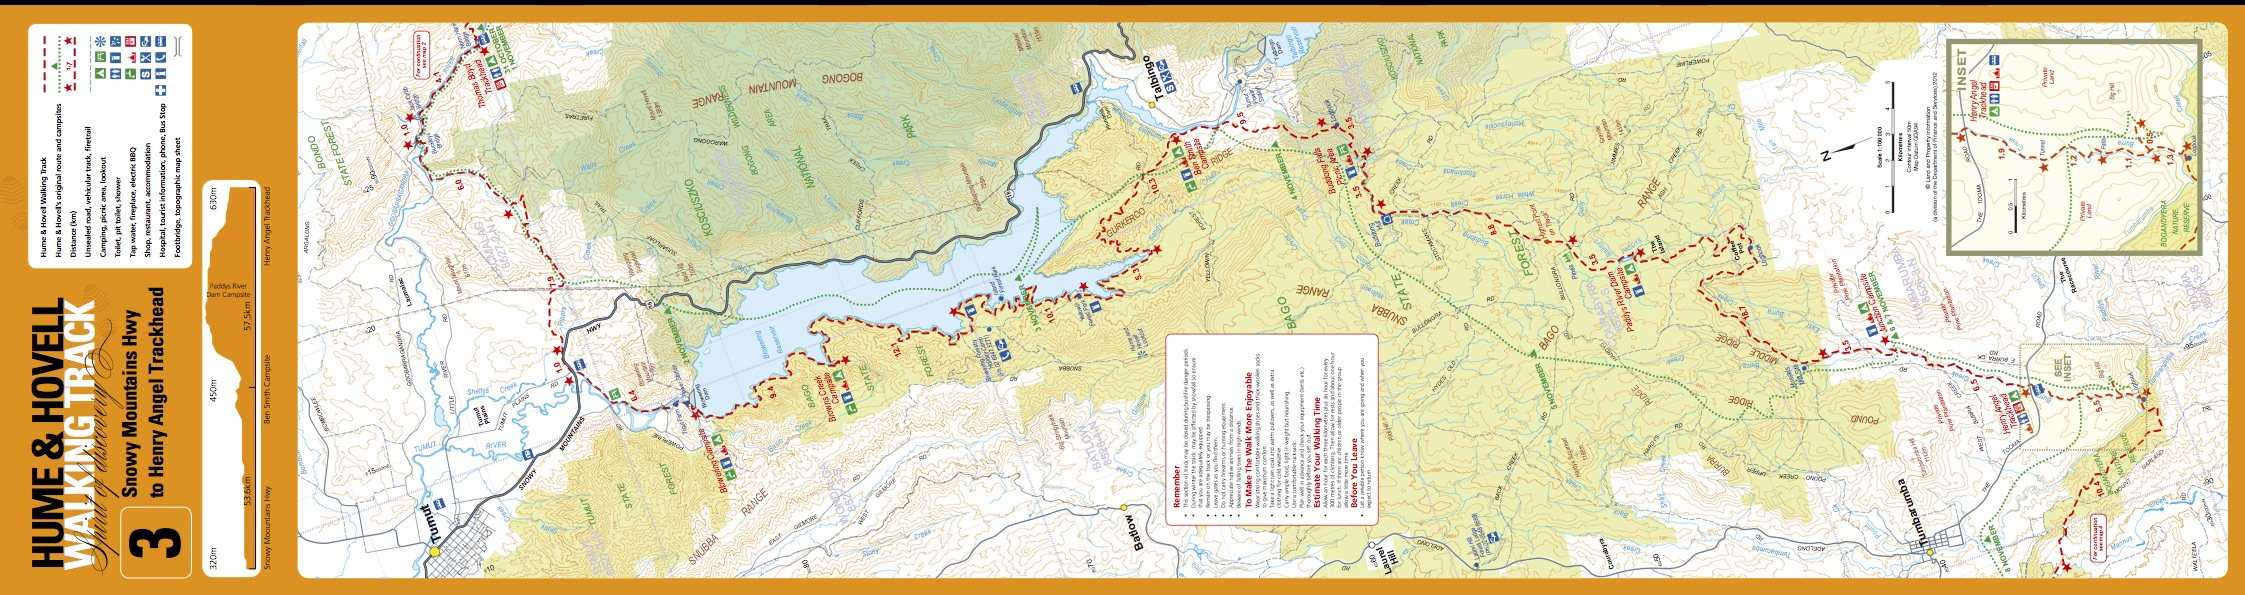 HH Track_Map3b.jpg